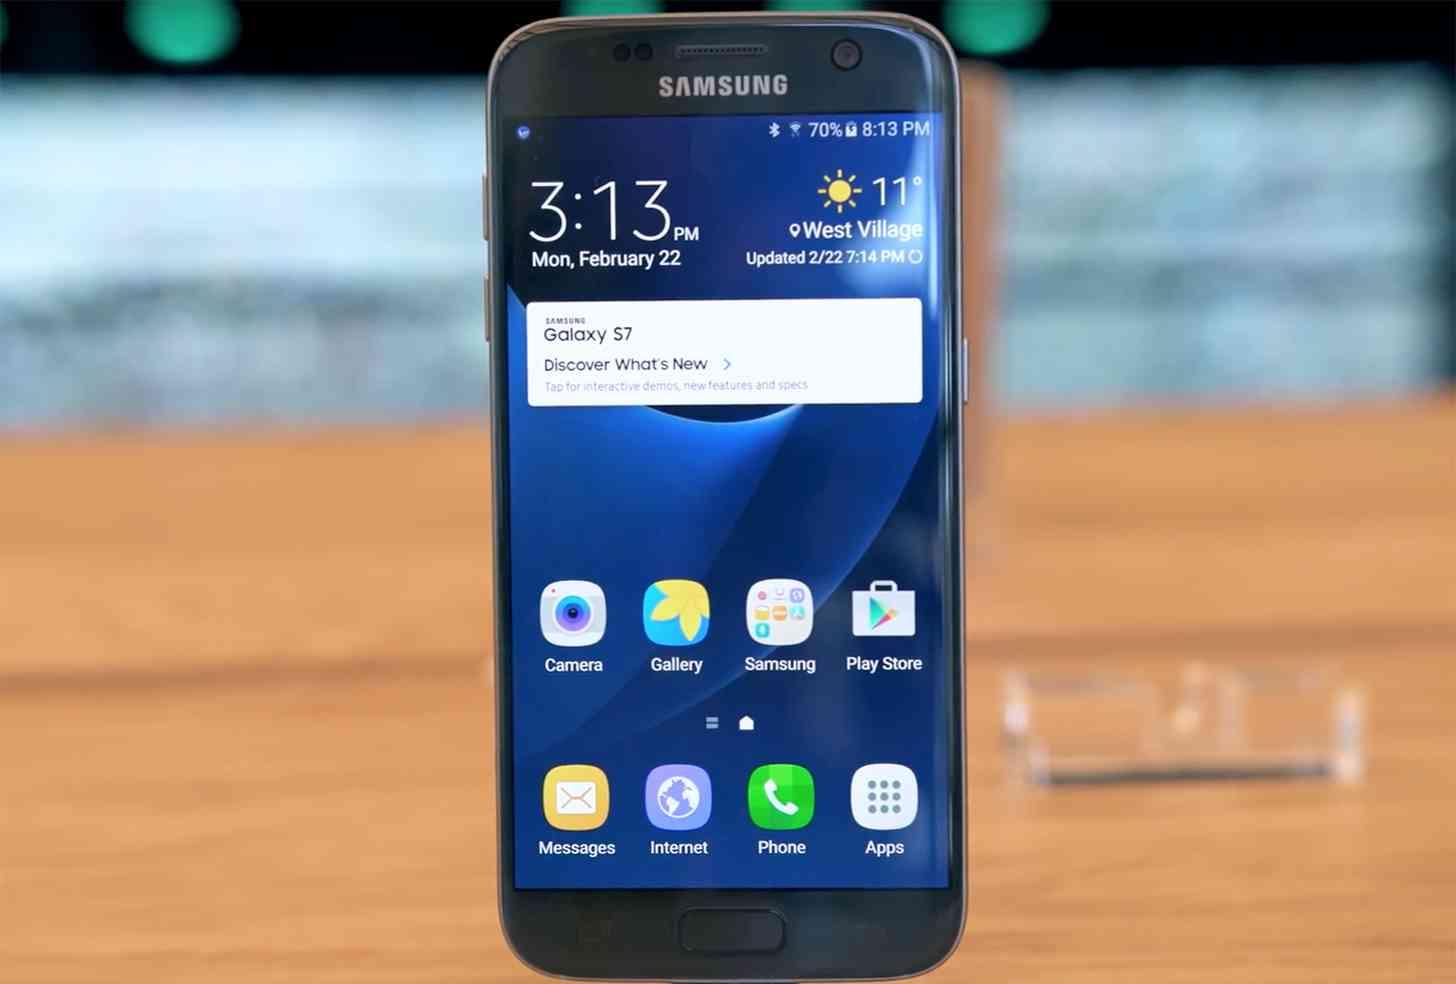 Samsung Galaxy S7 hands on